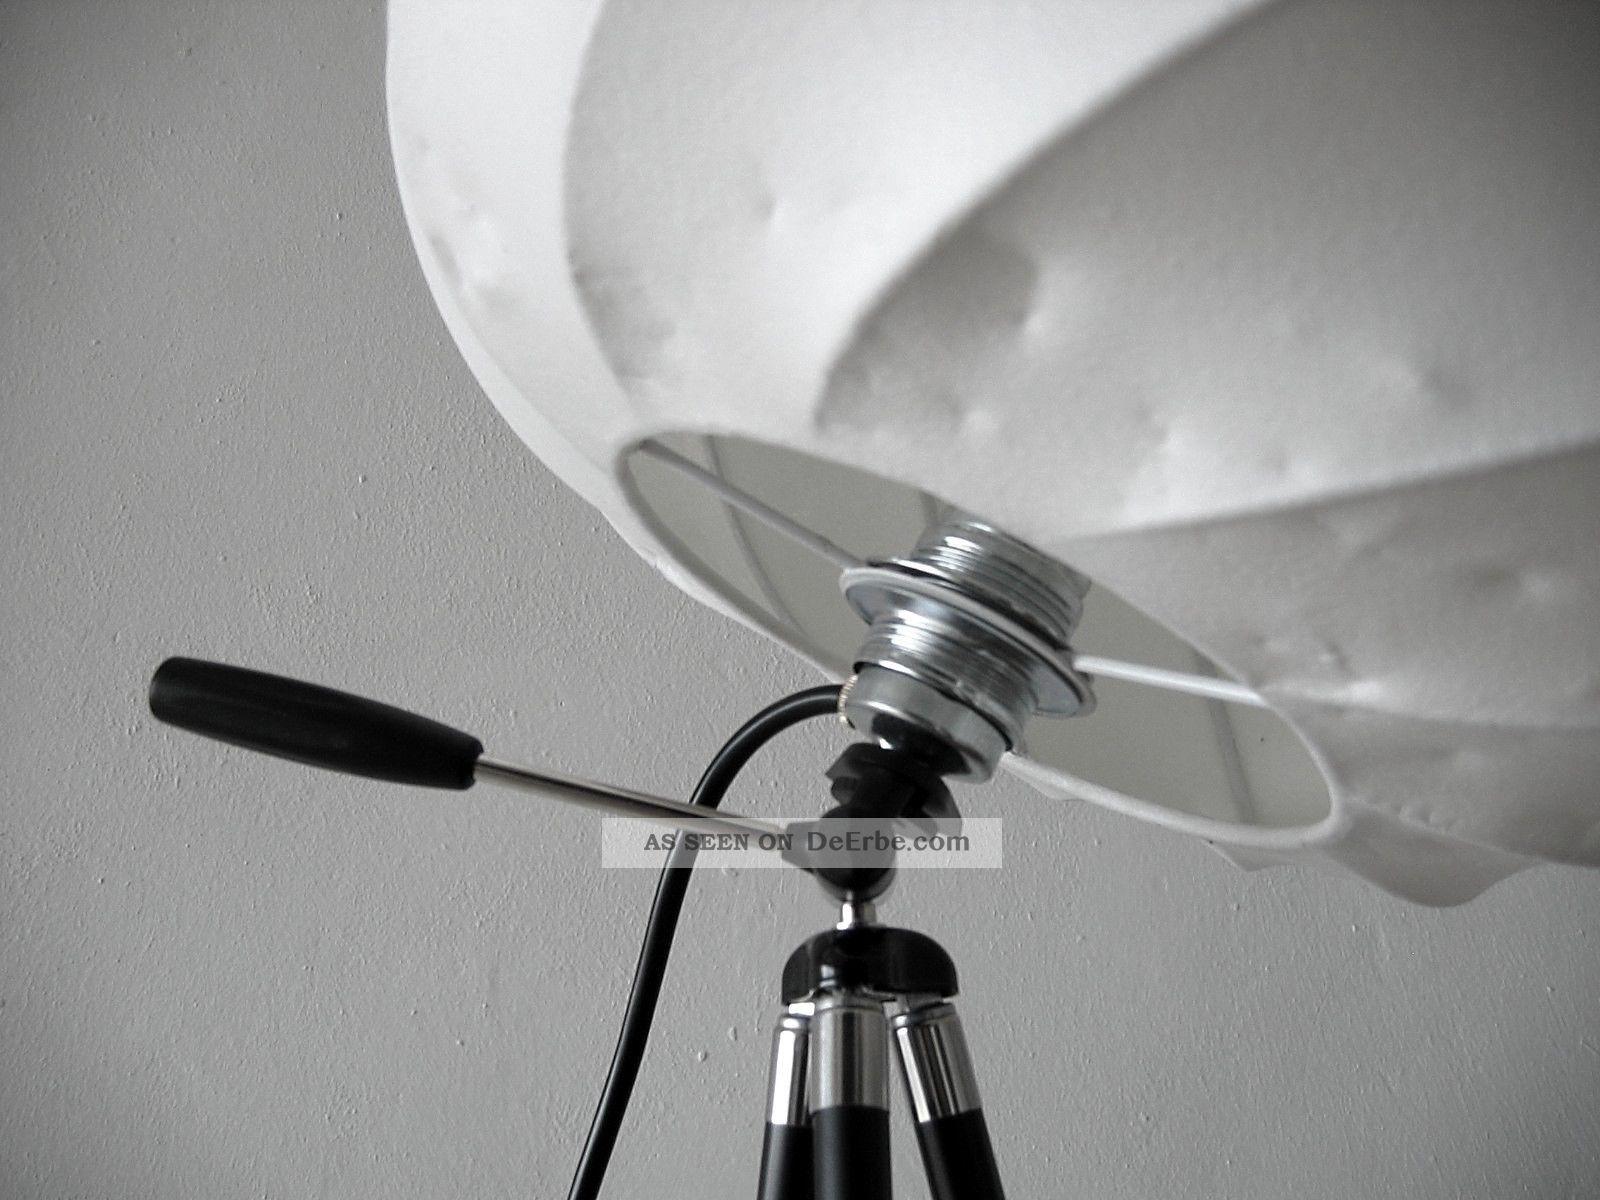 tripod cocoon stativ leuchte stehlampe castiglioni colani panton flos art. Black Bedroom Furniture Sets. Home Design Ideas